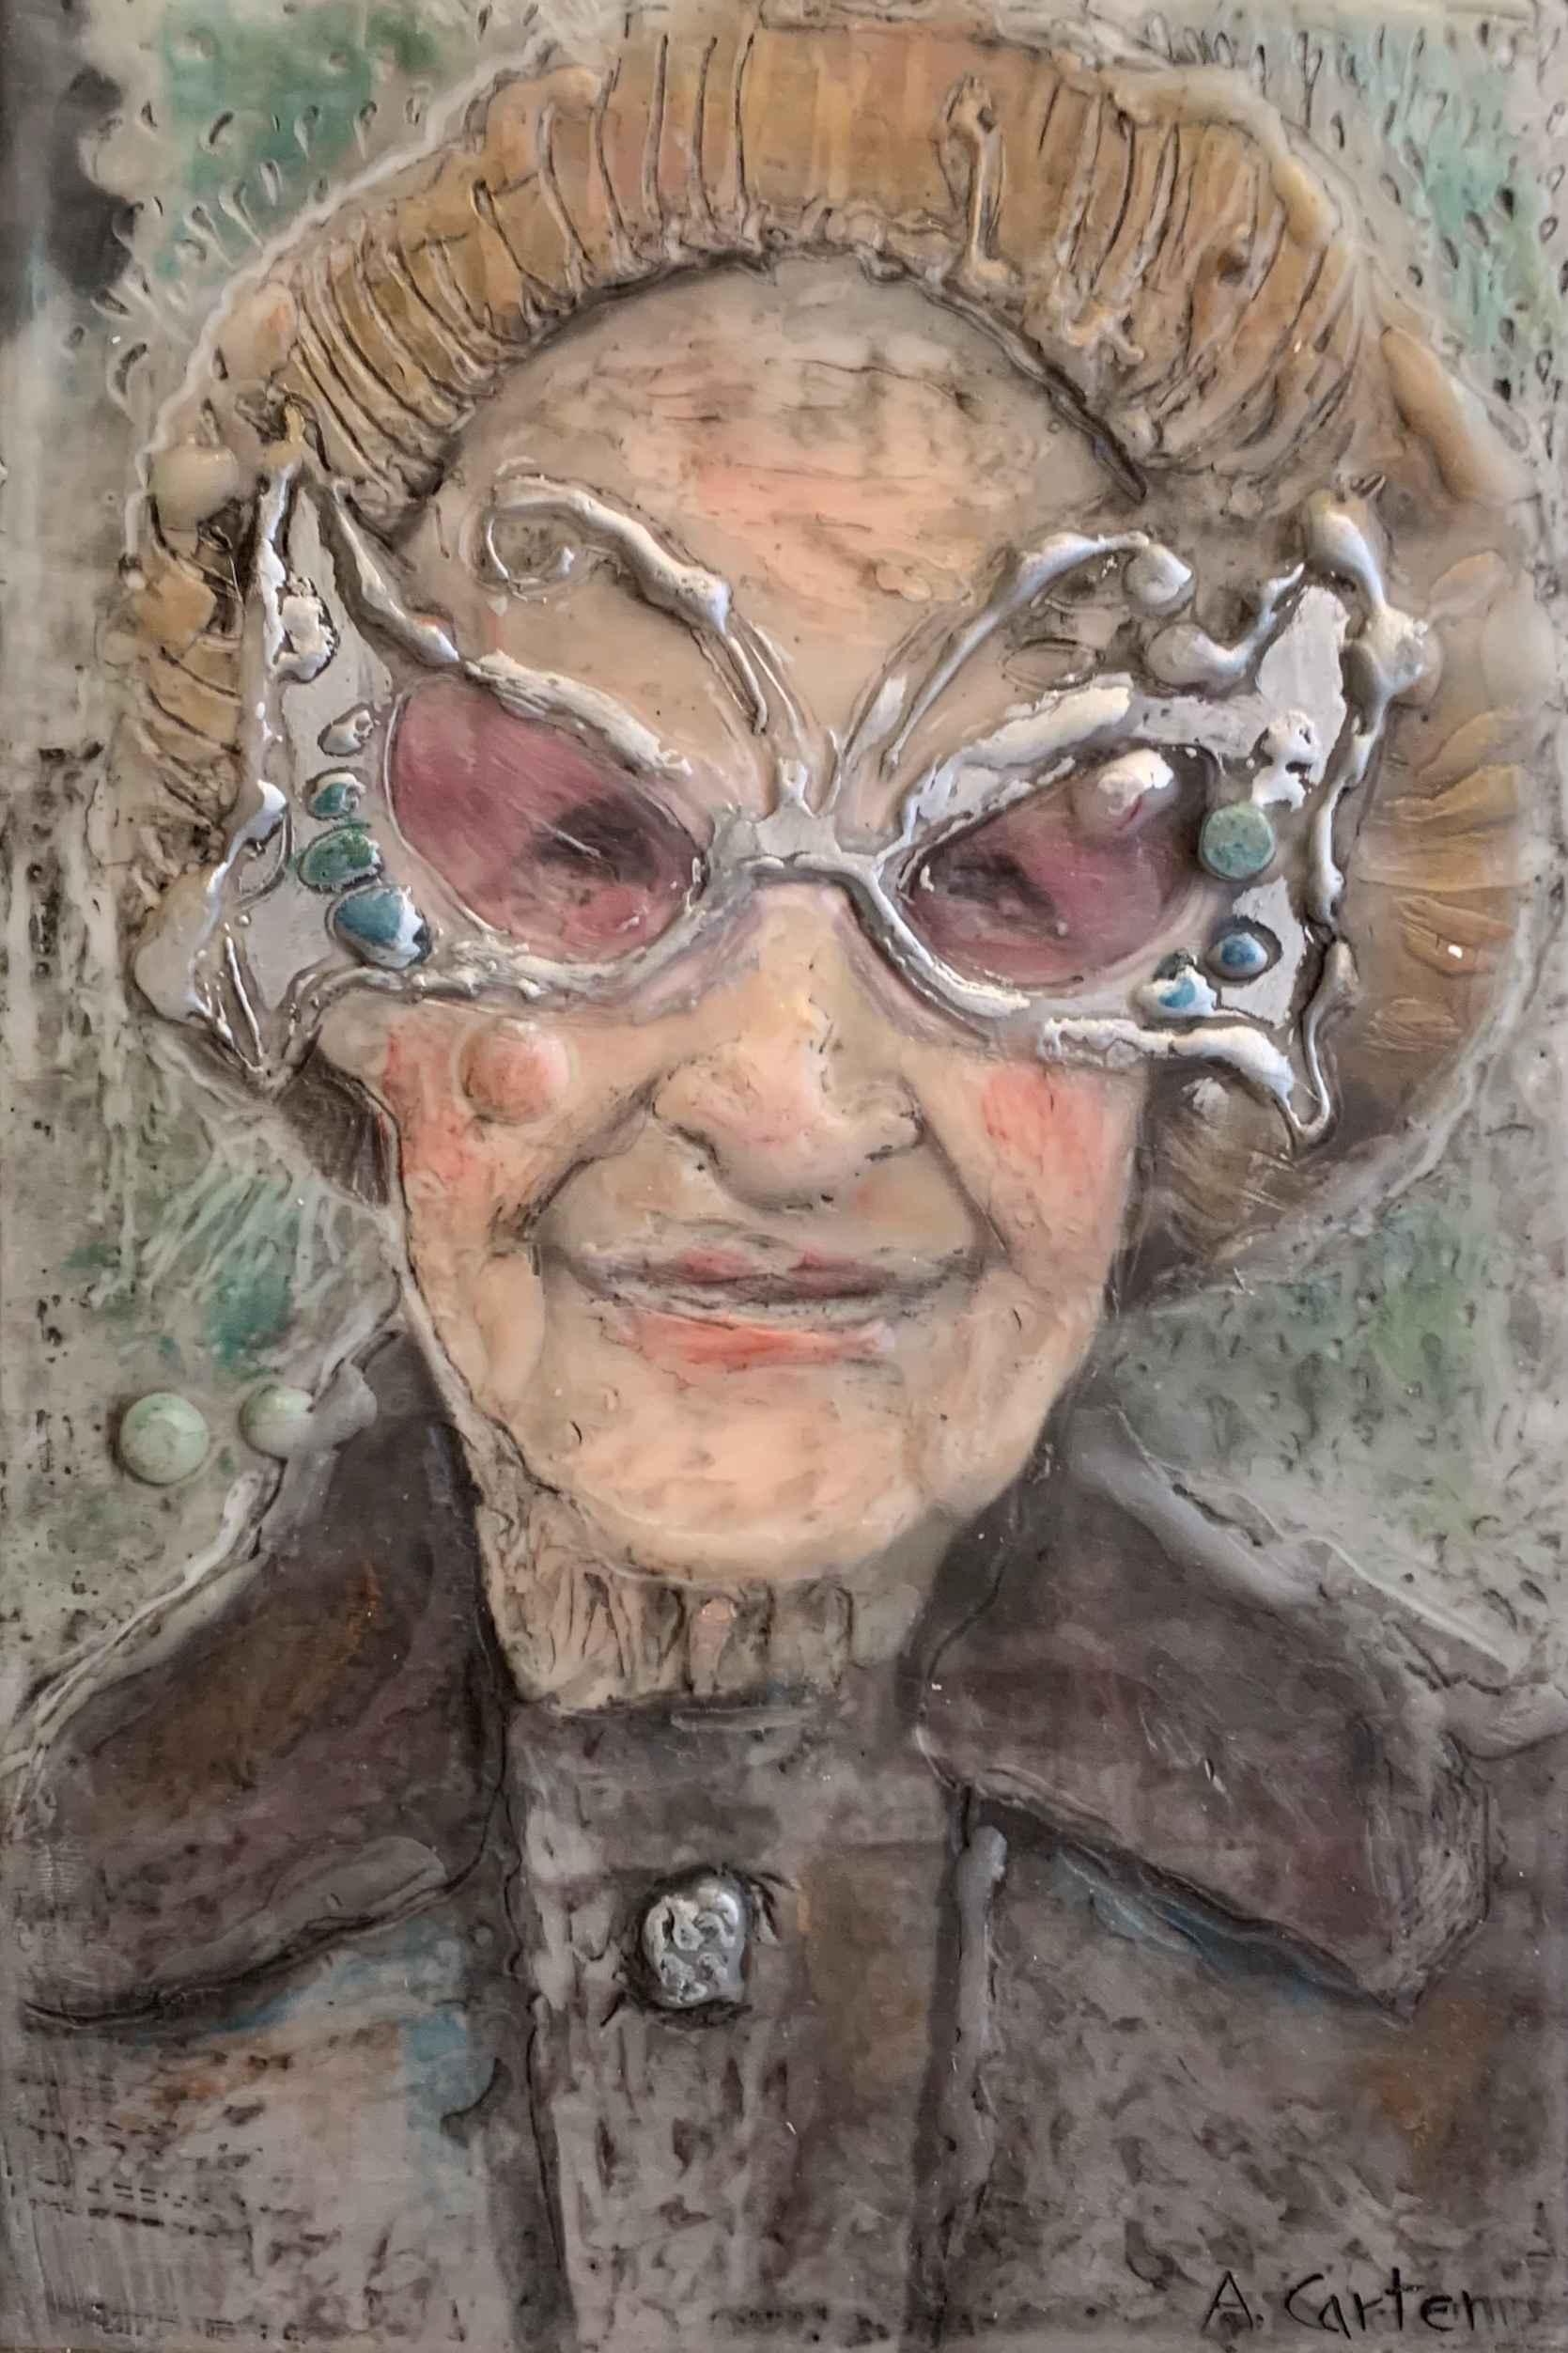 Lottie Views Life by  Ann L. Carter - Masterpiece Online